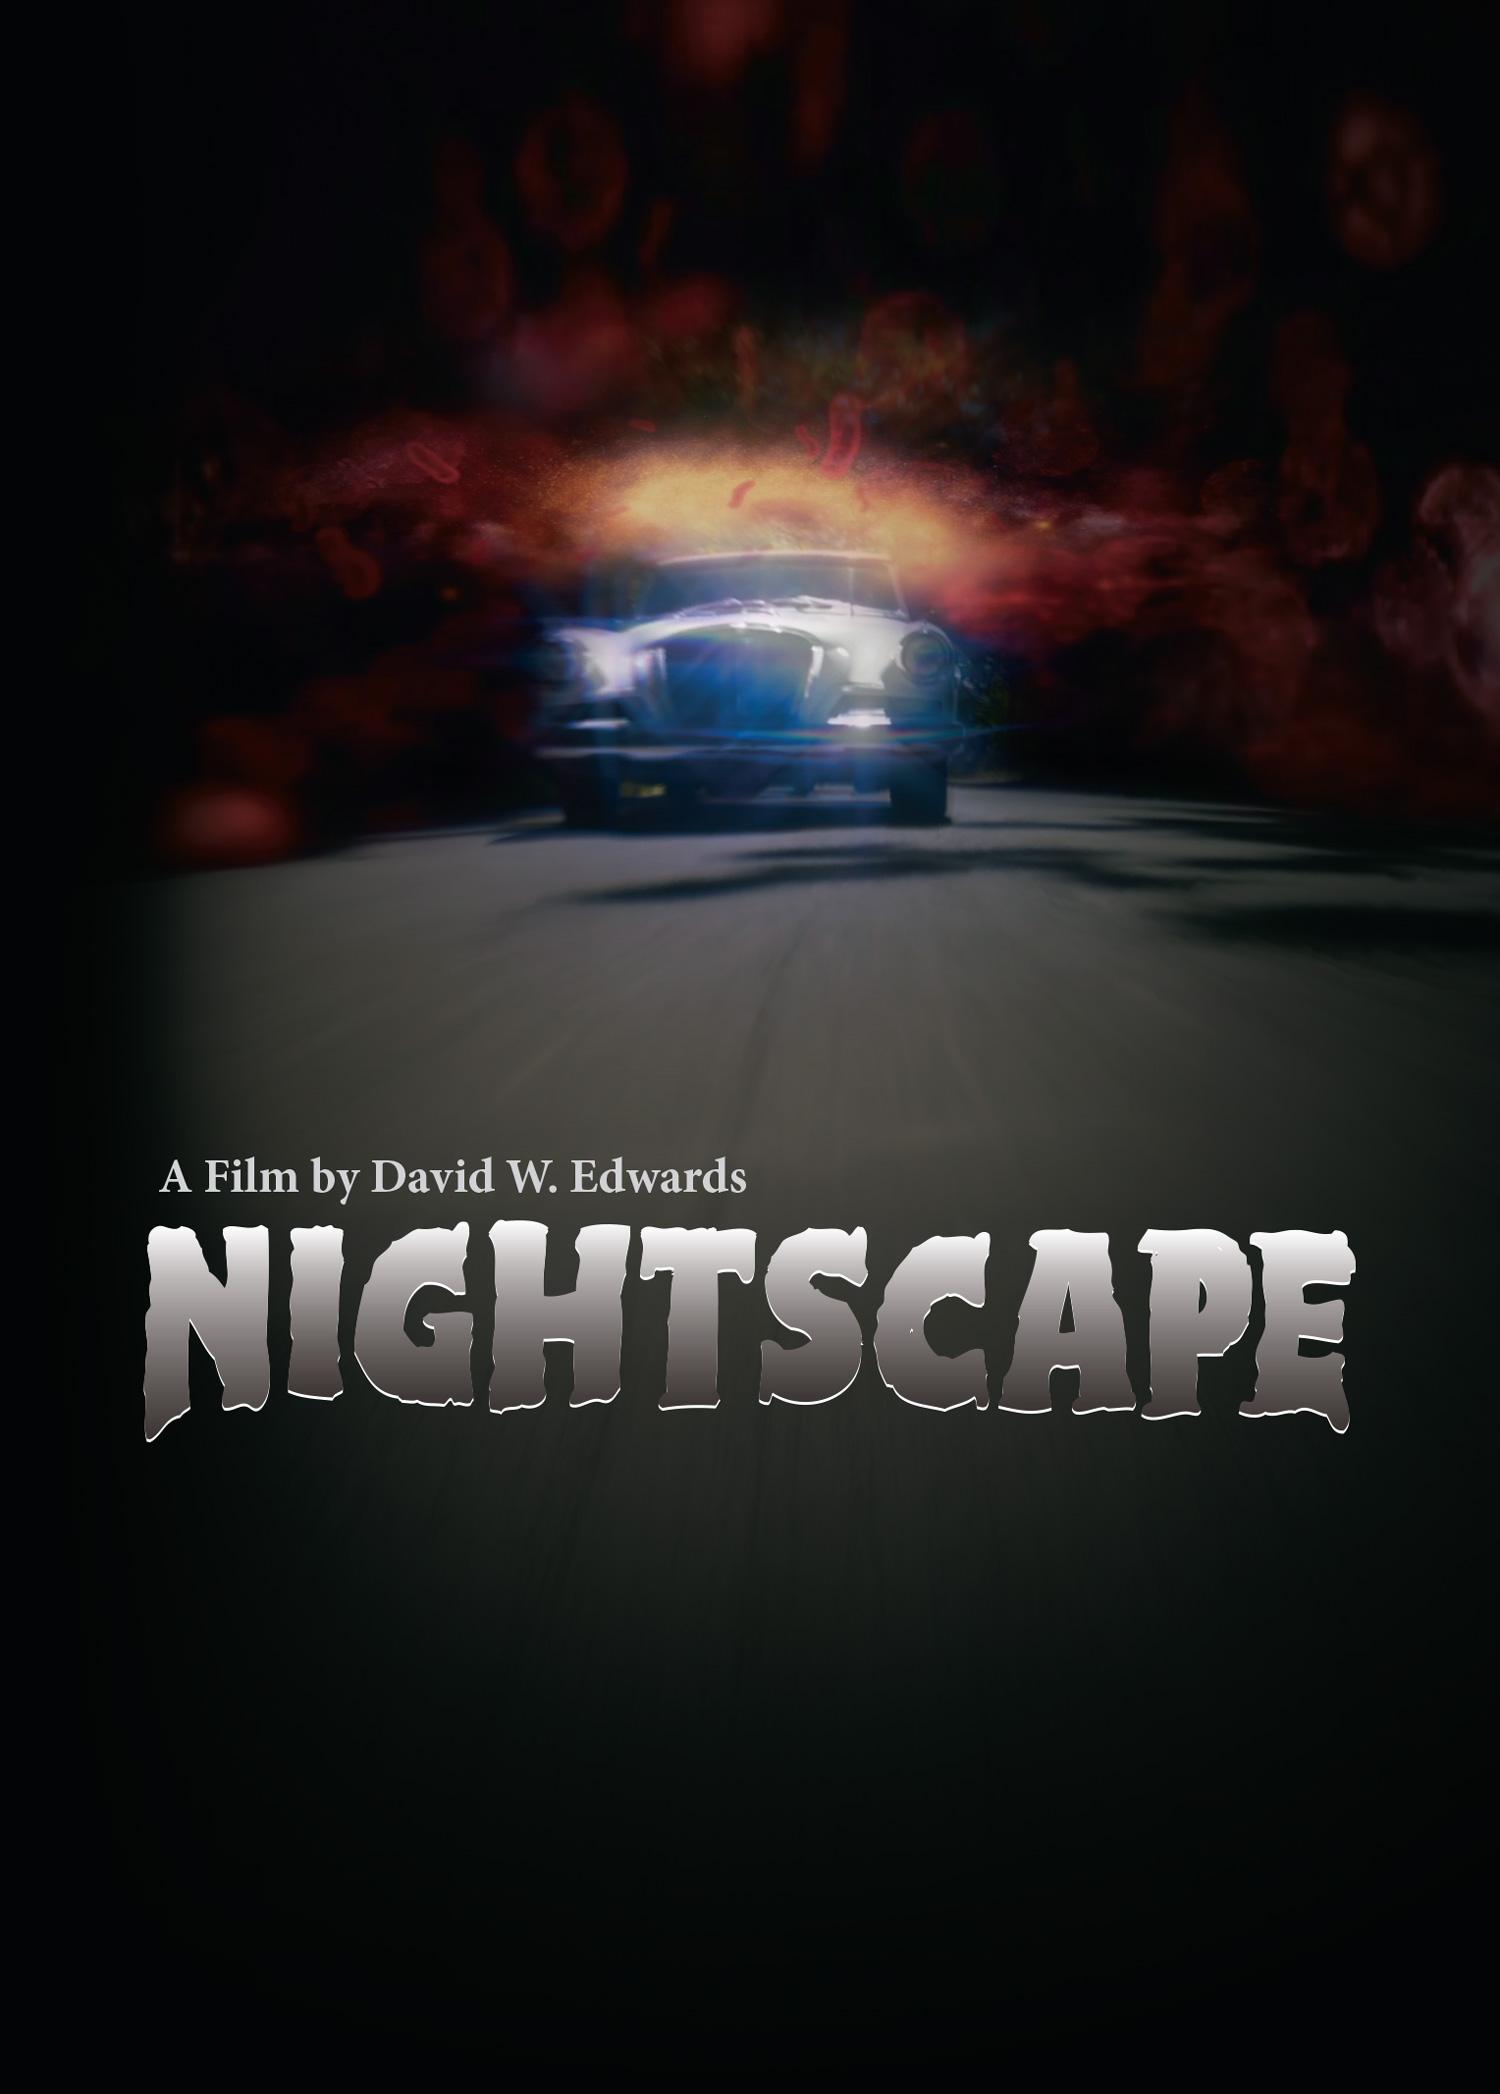 Nightscape DVD Cover